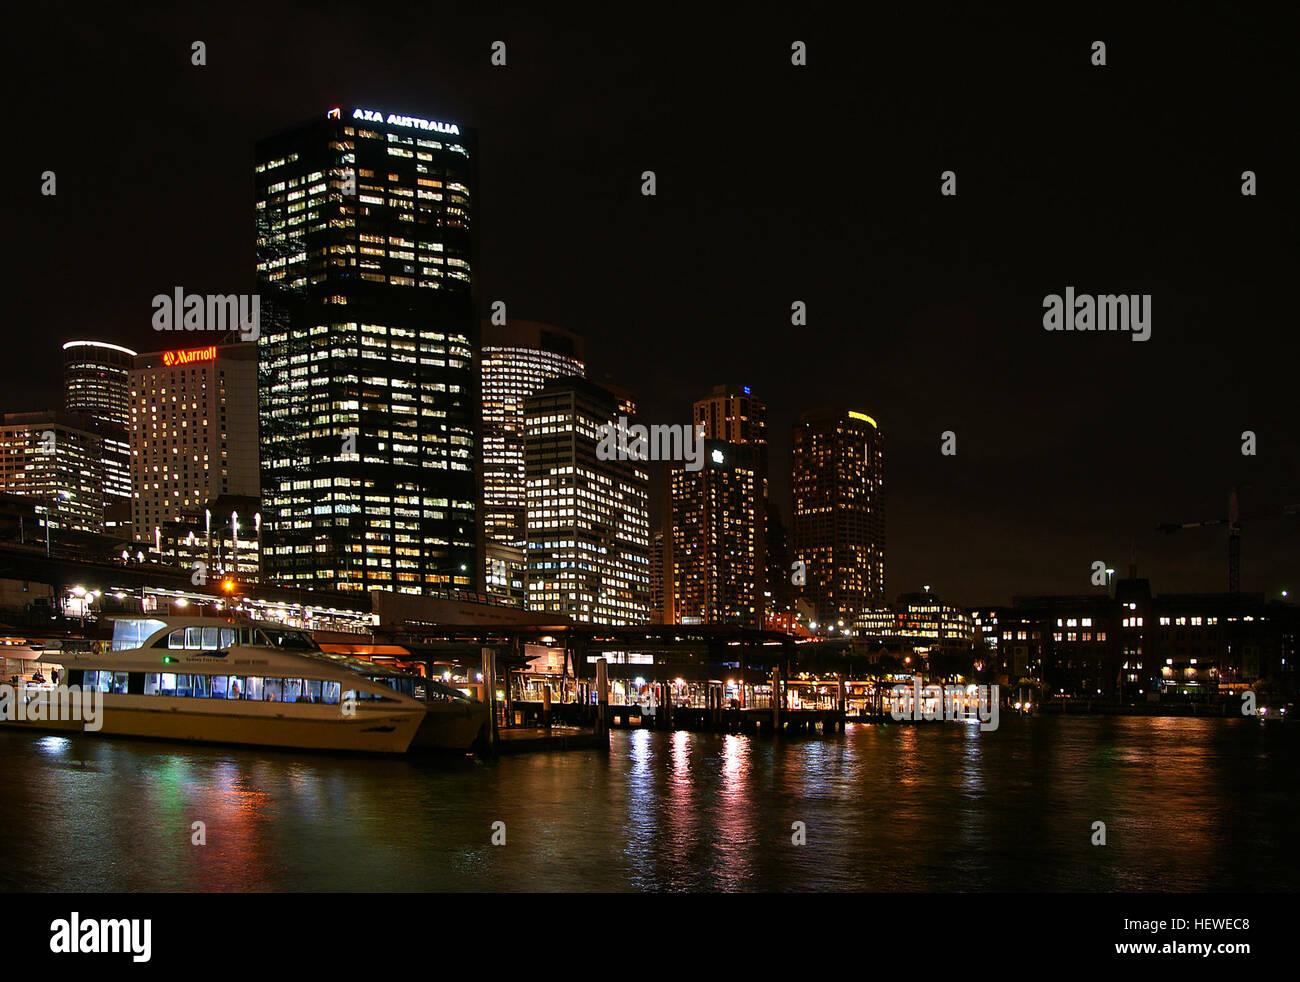 Boats Sydney,City Lights,Ferries,Ferry,Harbour Cruises,High Rise,Niight  Views Sydney,Sydney Australia,Sydney Habour,Sydney Harbour Bridge,Sydney  Opera Hpuse ...